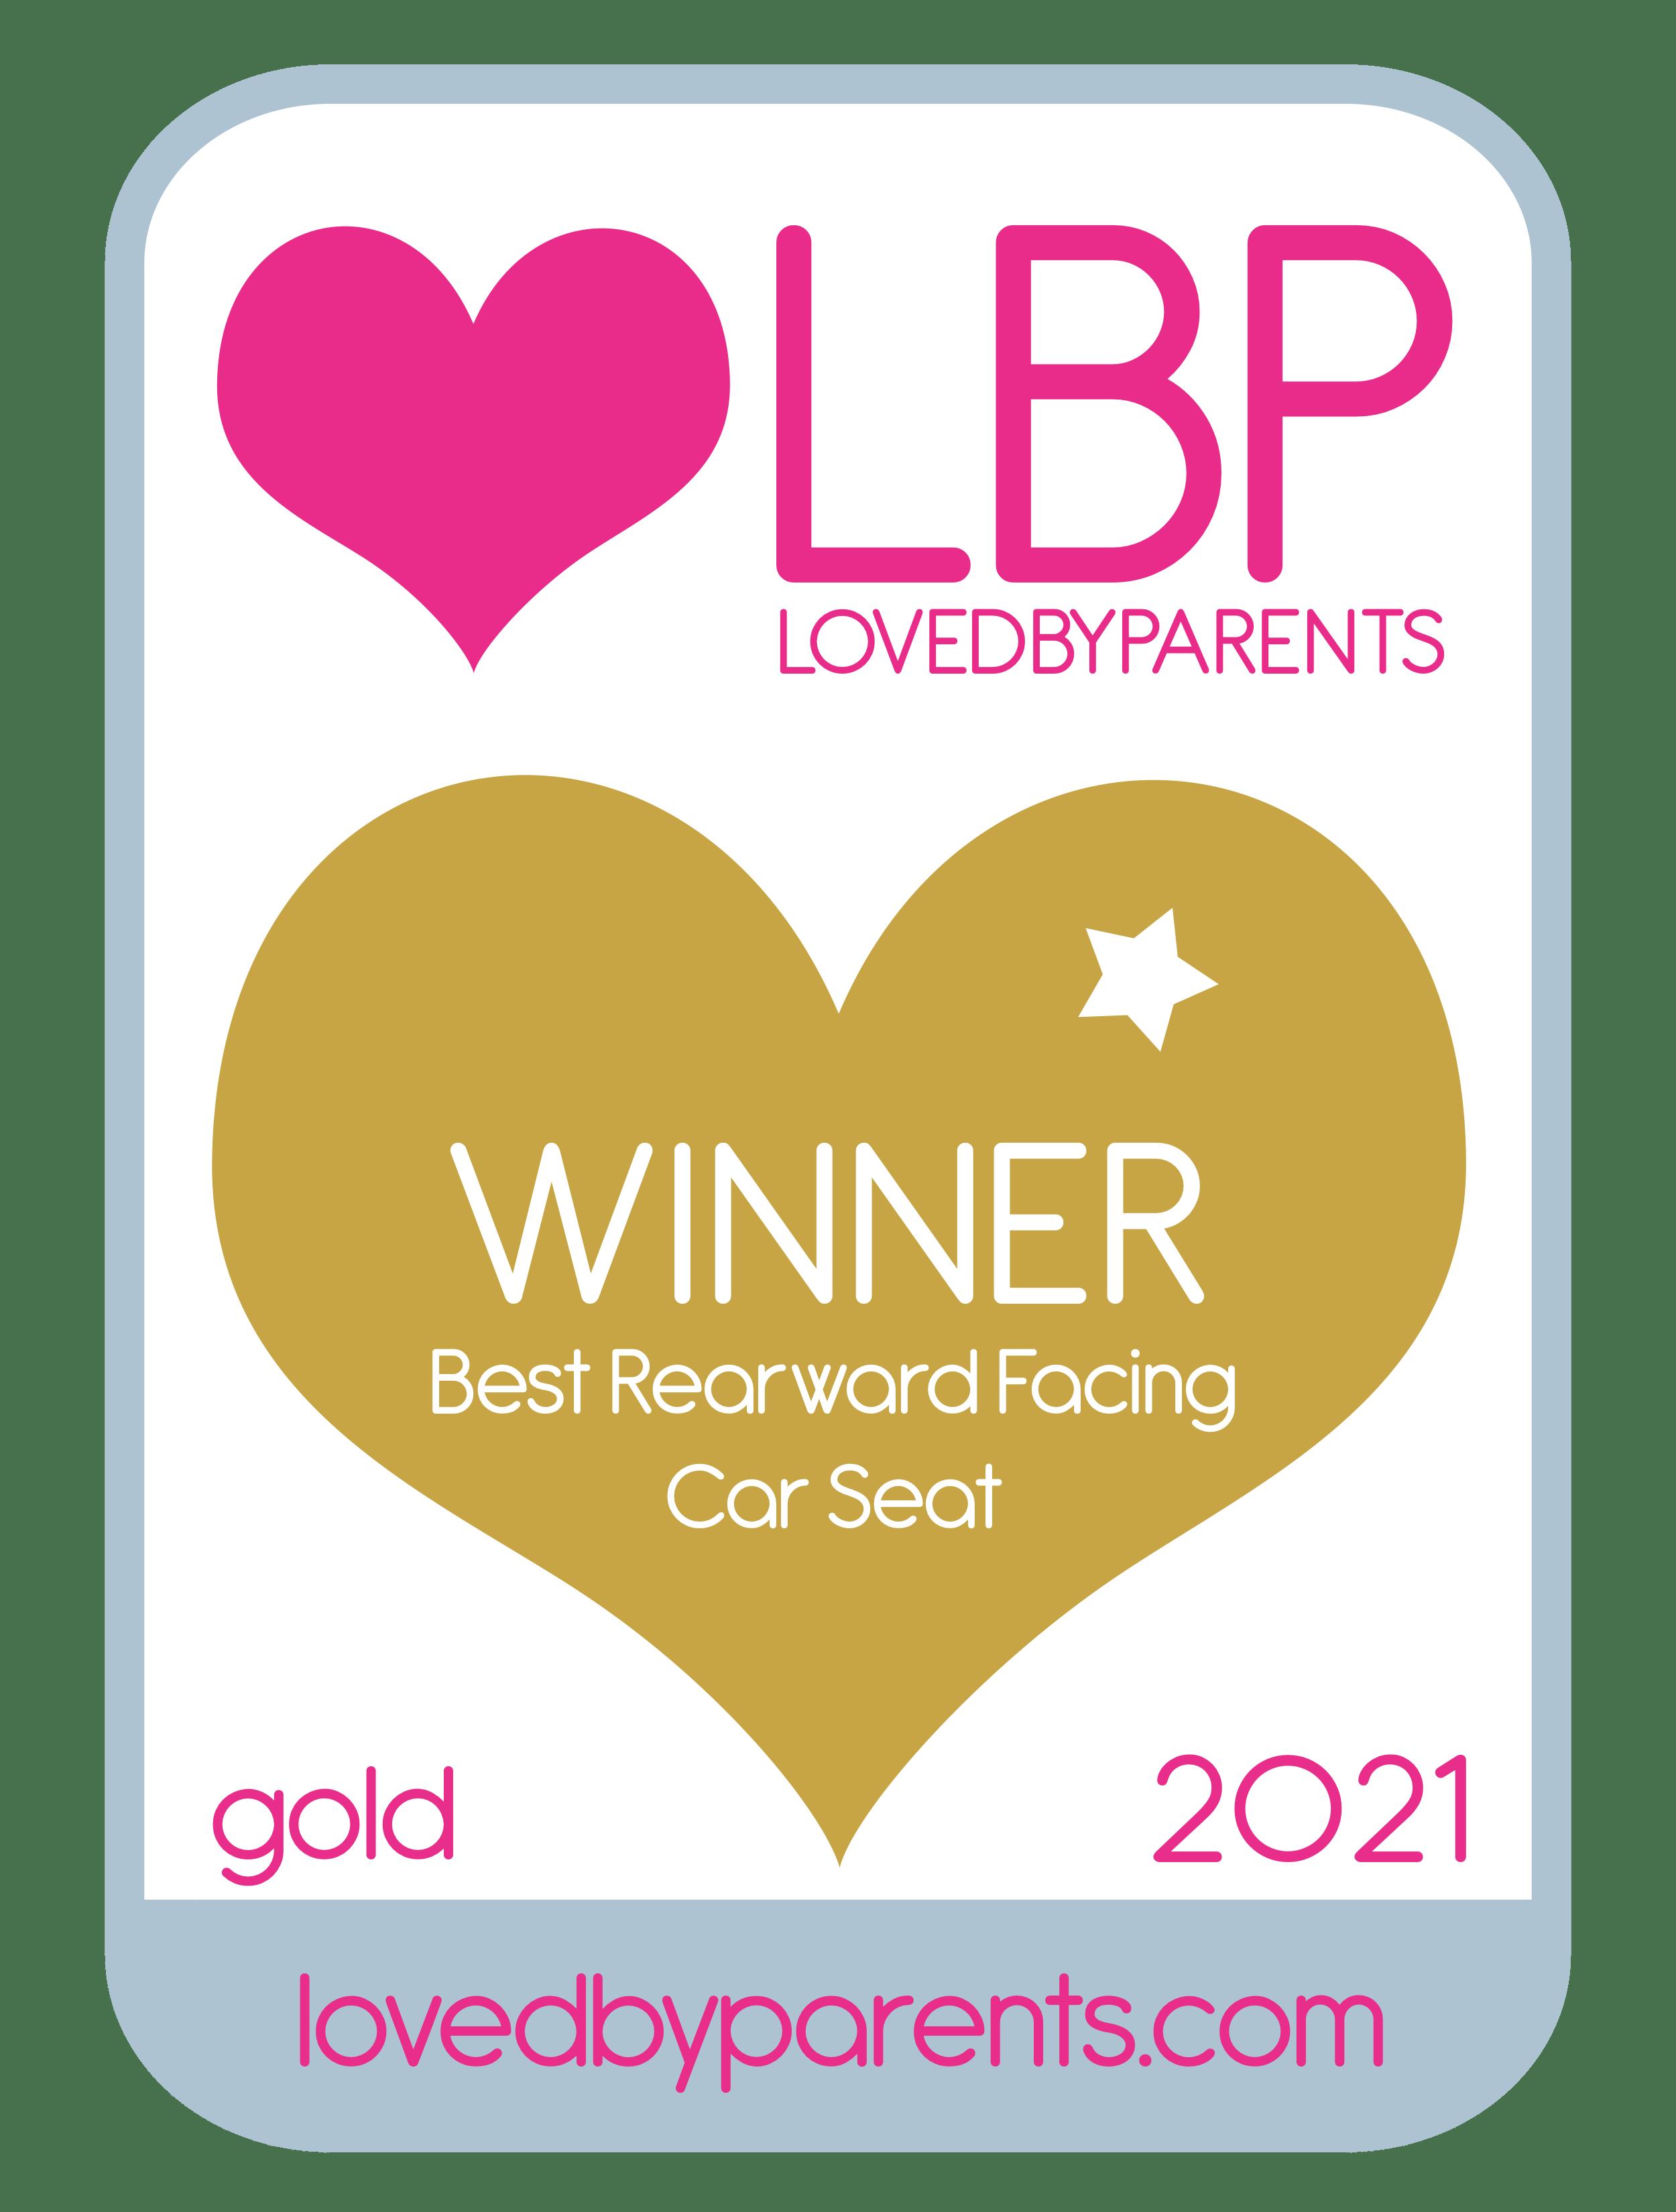 Best Rearward Facing Car Seat 2021 – LBP